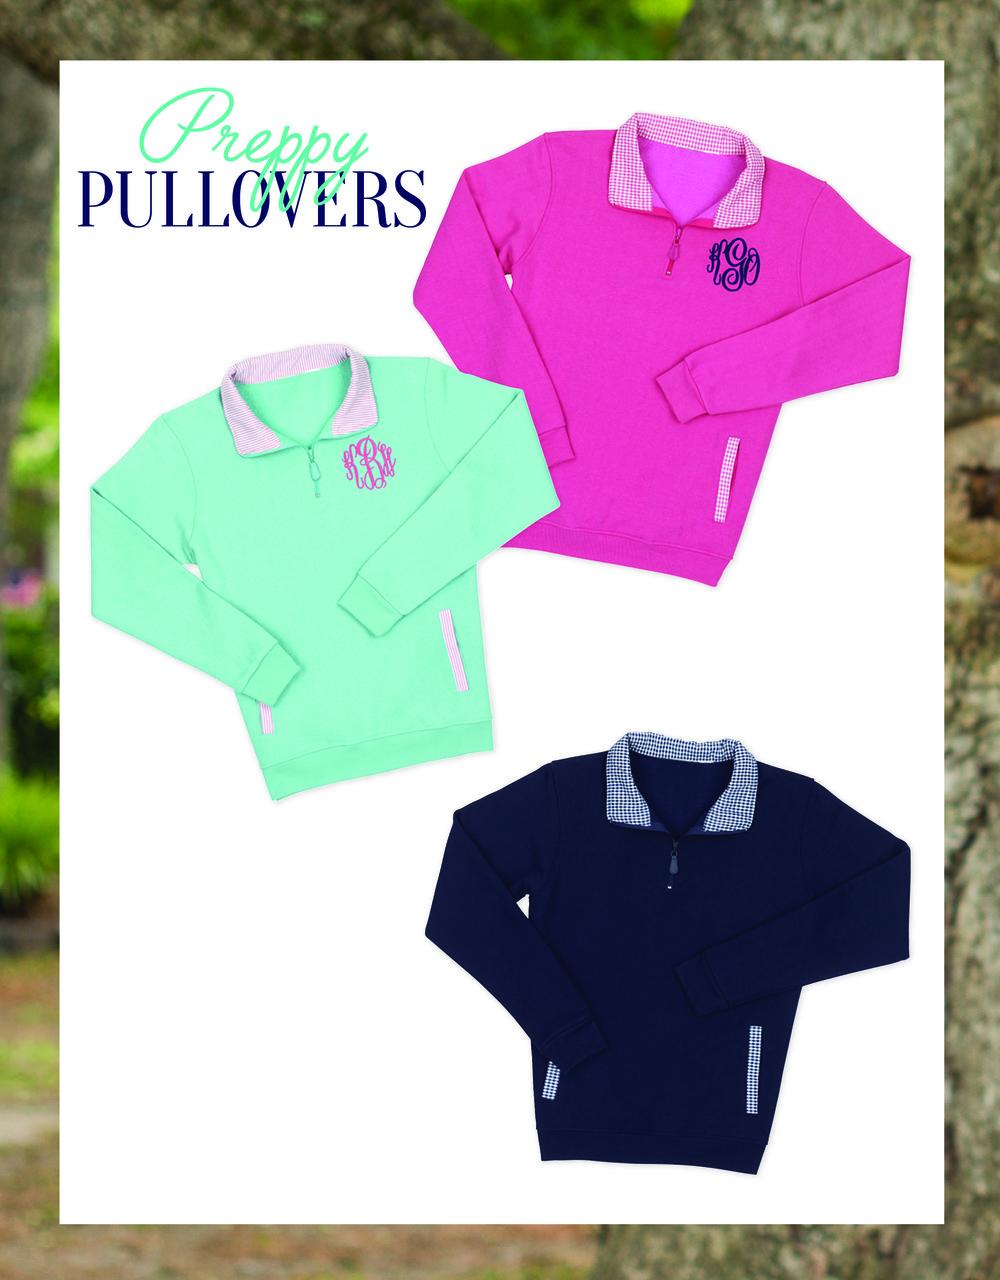 Pullovers.jpg